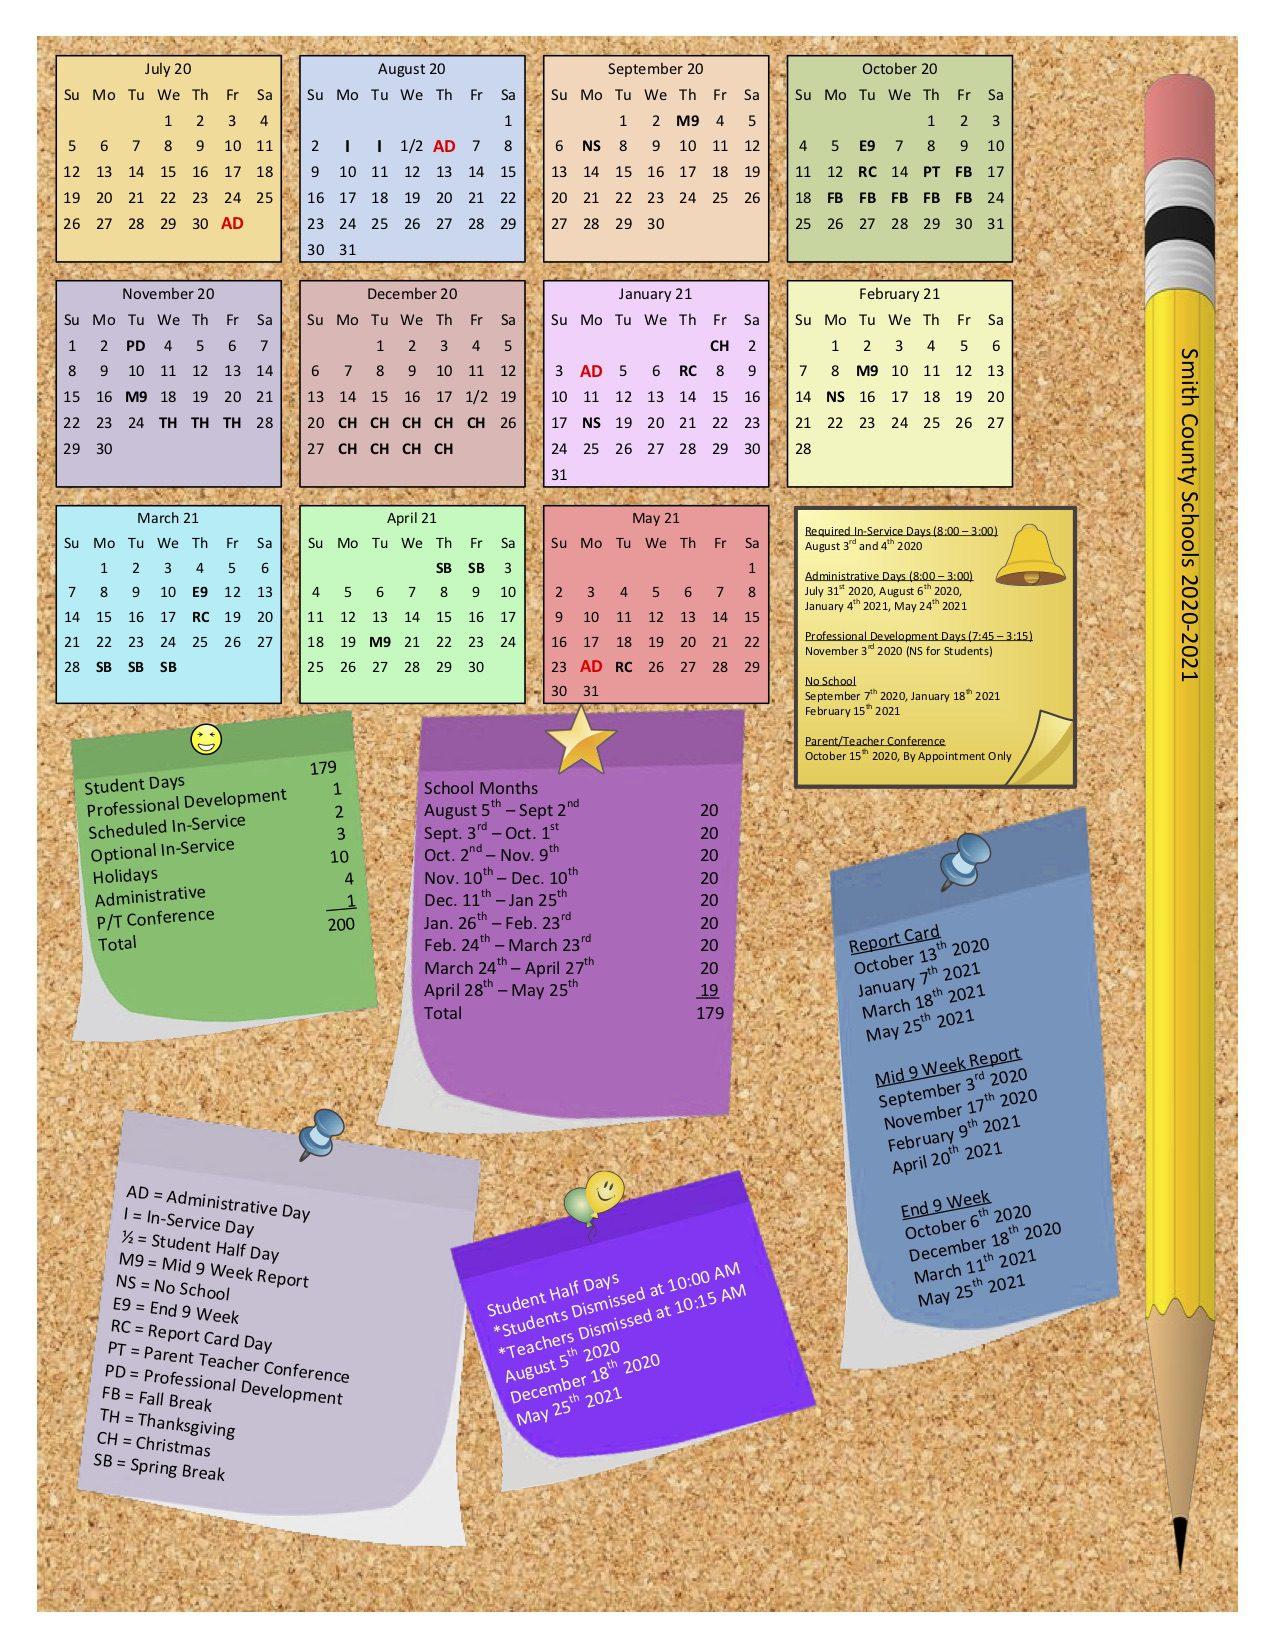 Smith County School Board approves 2020/2021 School Calendar